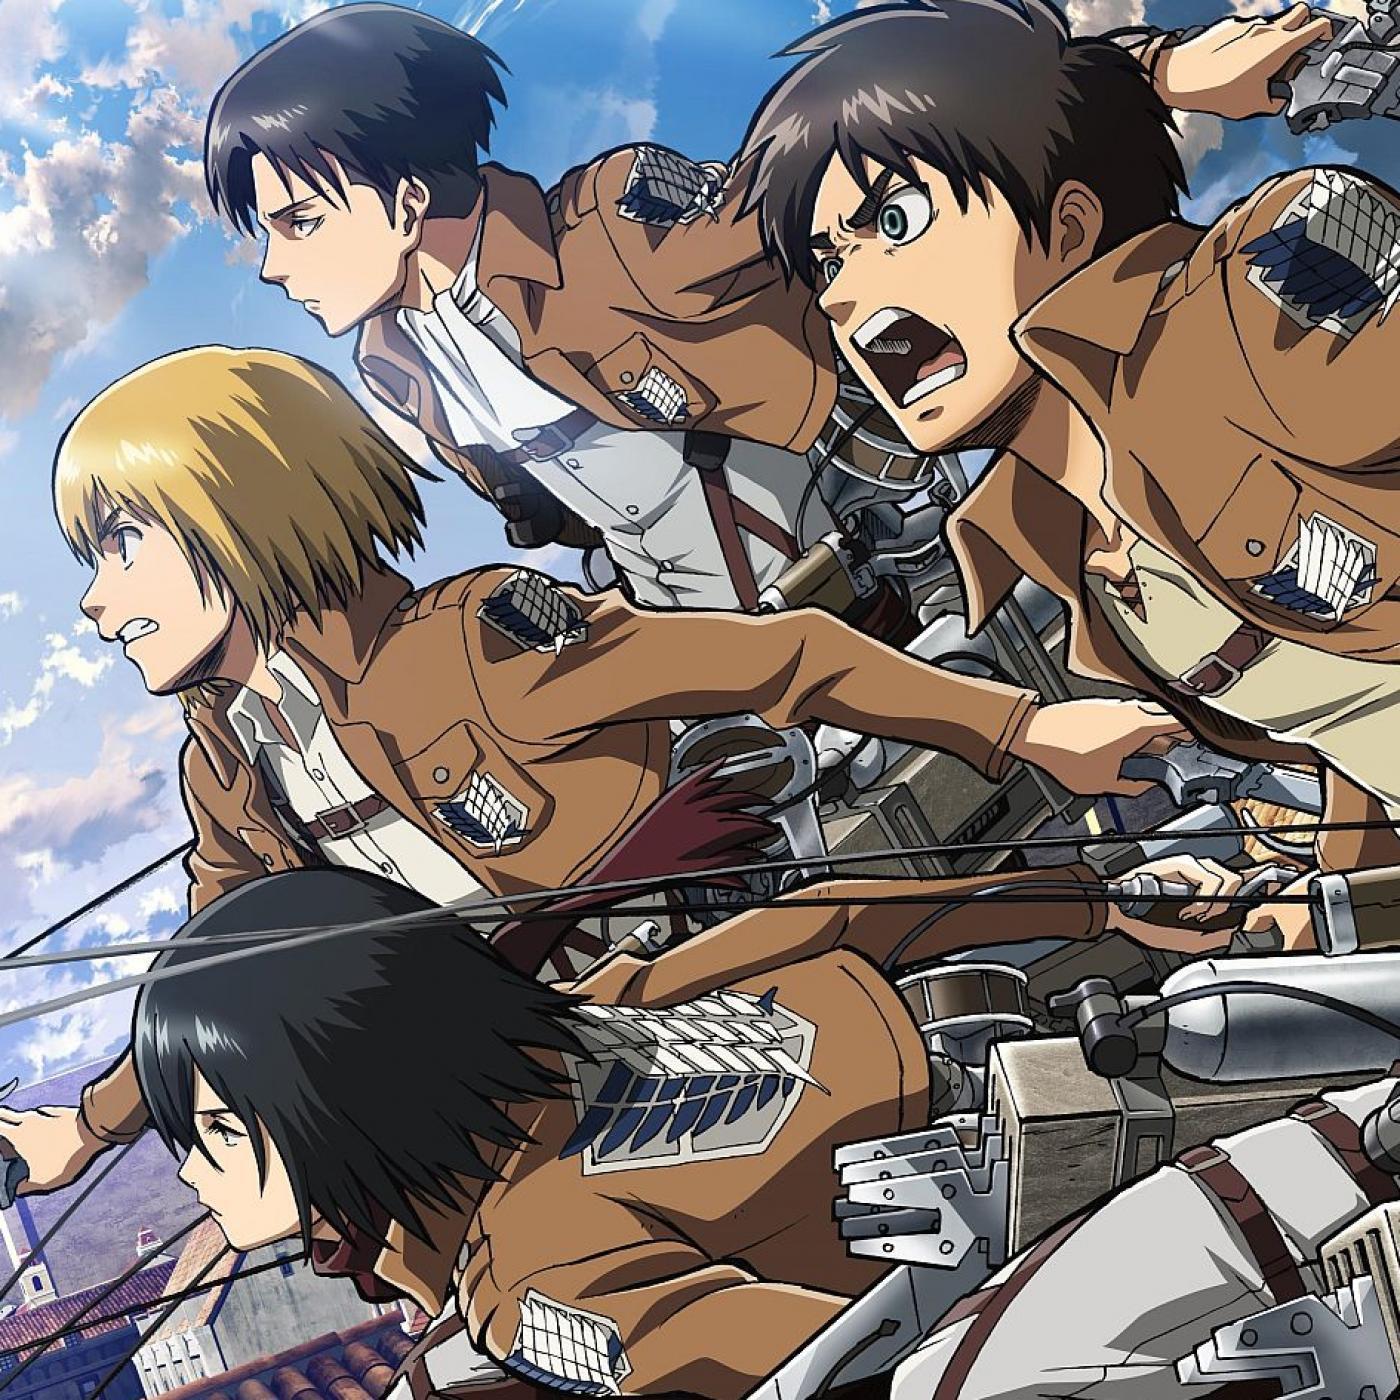 2x09 - Animes con interferencias / Spin Off: Wrestlemania 32